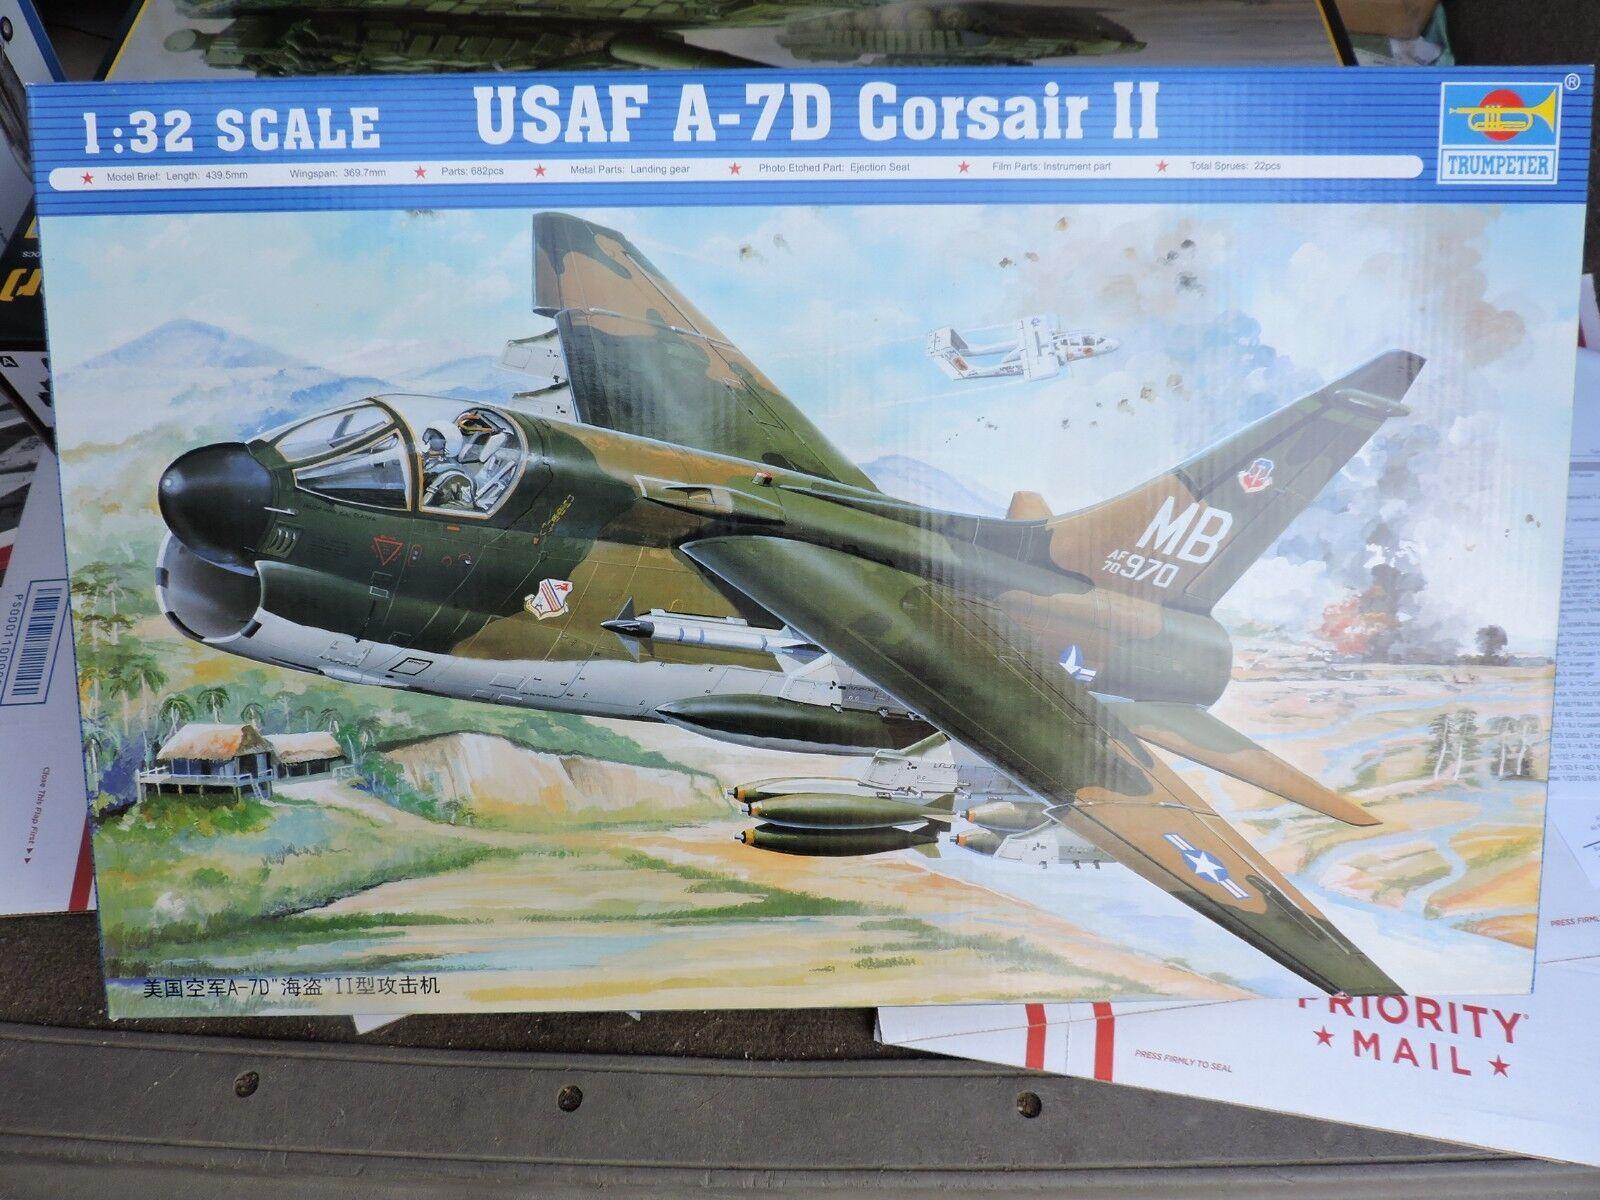 acquista marca 02245 1 32 Scale USAF A-7D Corsair II II II Airplane Combatiente Warplane Trumpeter  vendita all'ingrosso